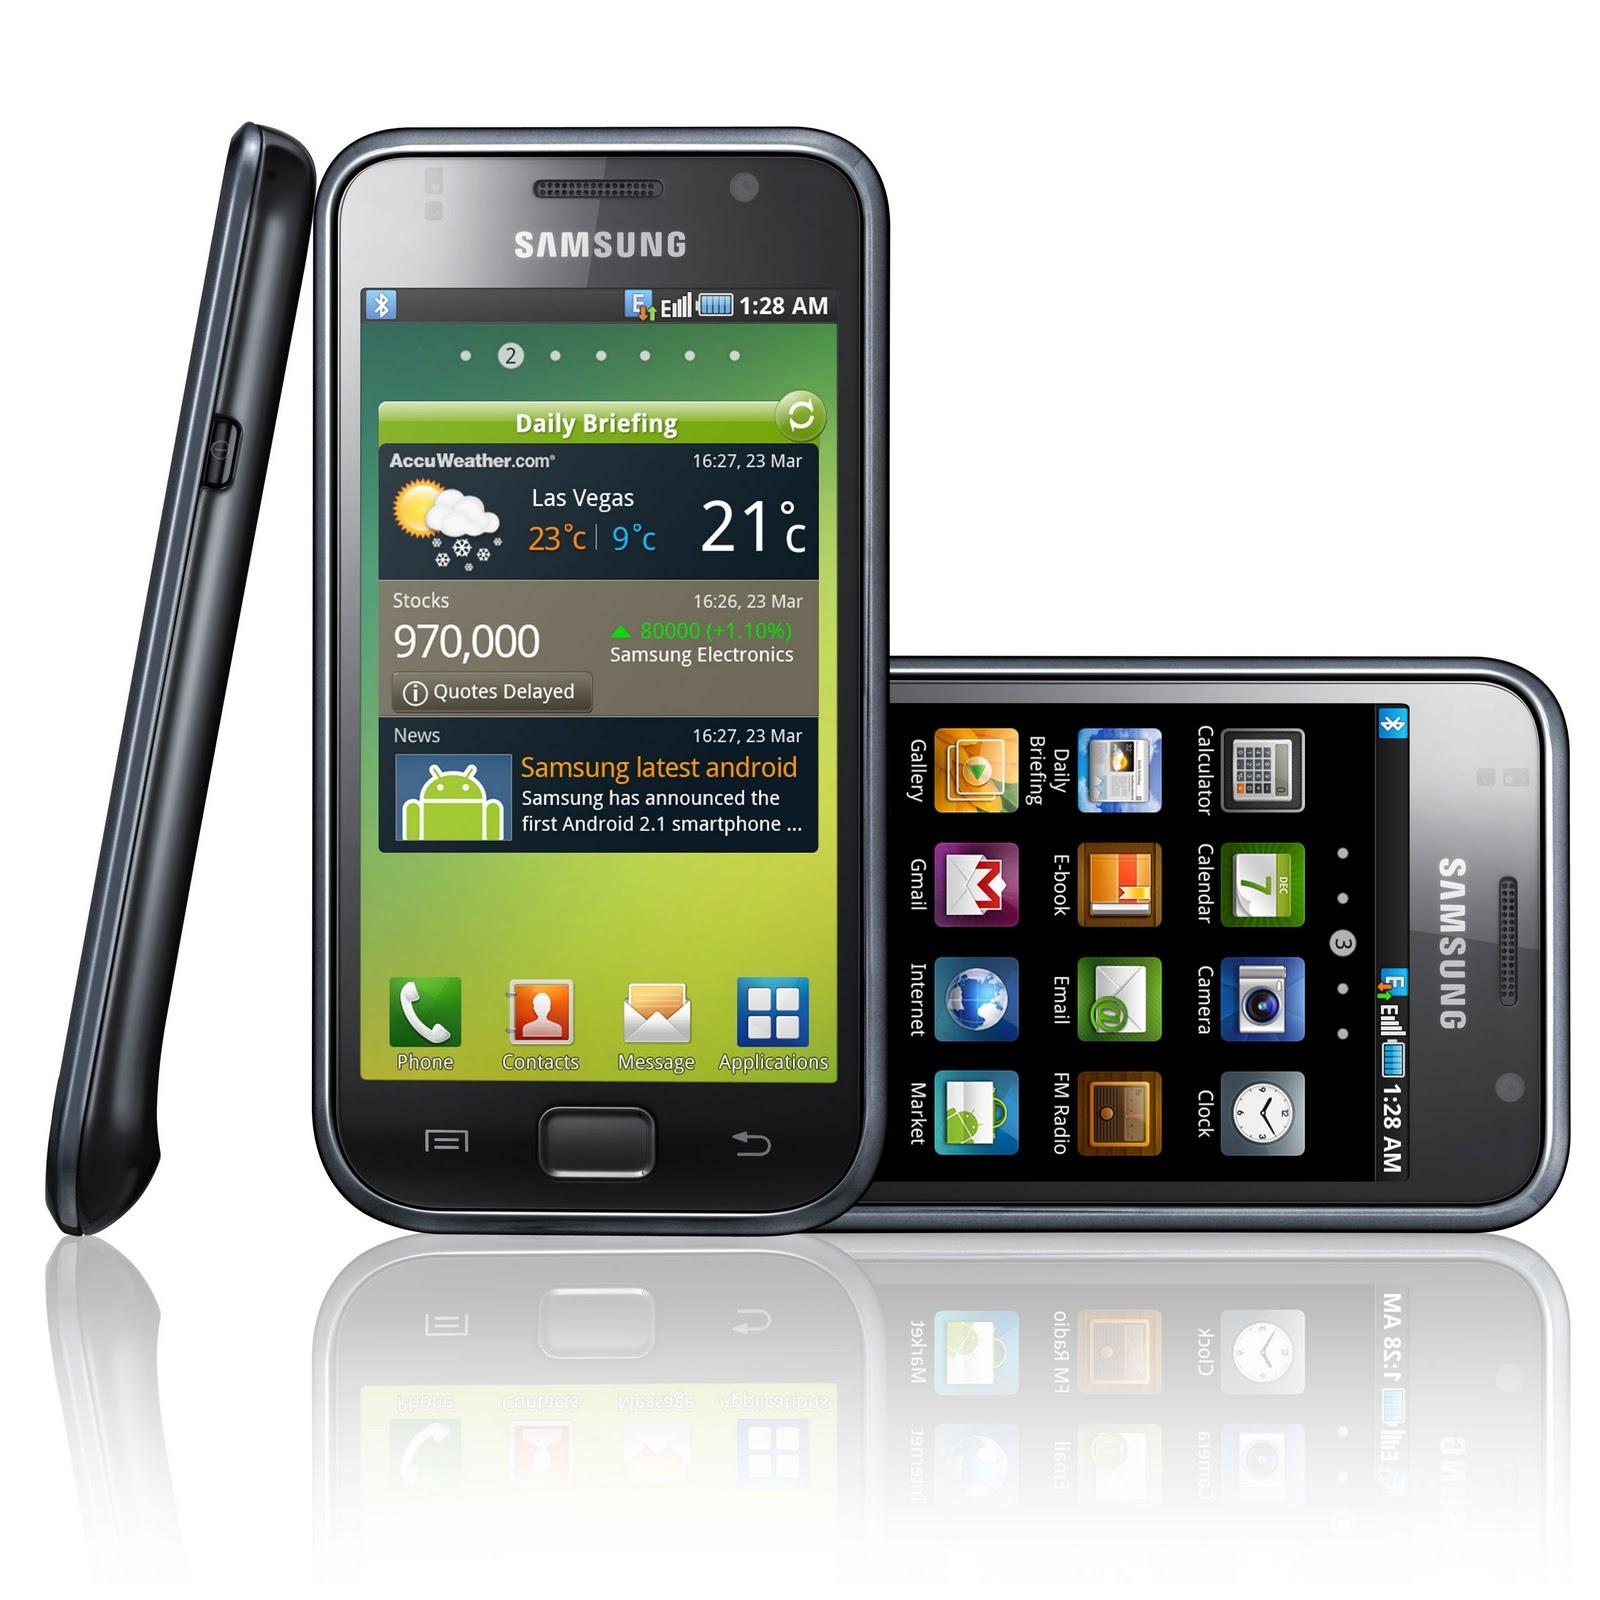 http://2.bp.blogspot.com/_3s5CHSQ3vWY/TQqtFuyVPxI/AAAAAAAAAEI/Iw3MhcKsjGw/s1600/Samsung-GalaxyS.jpg